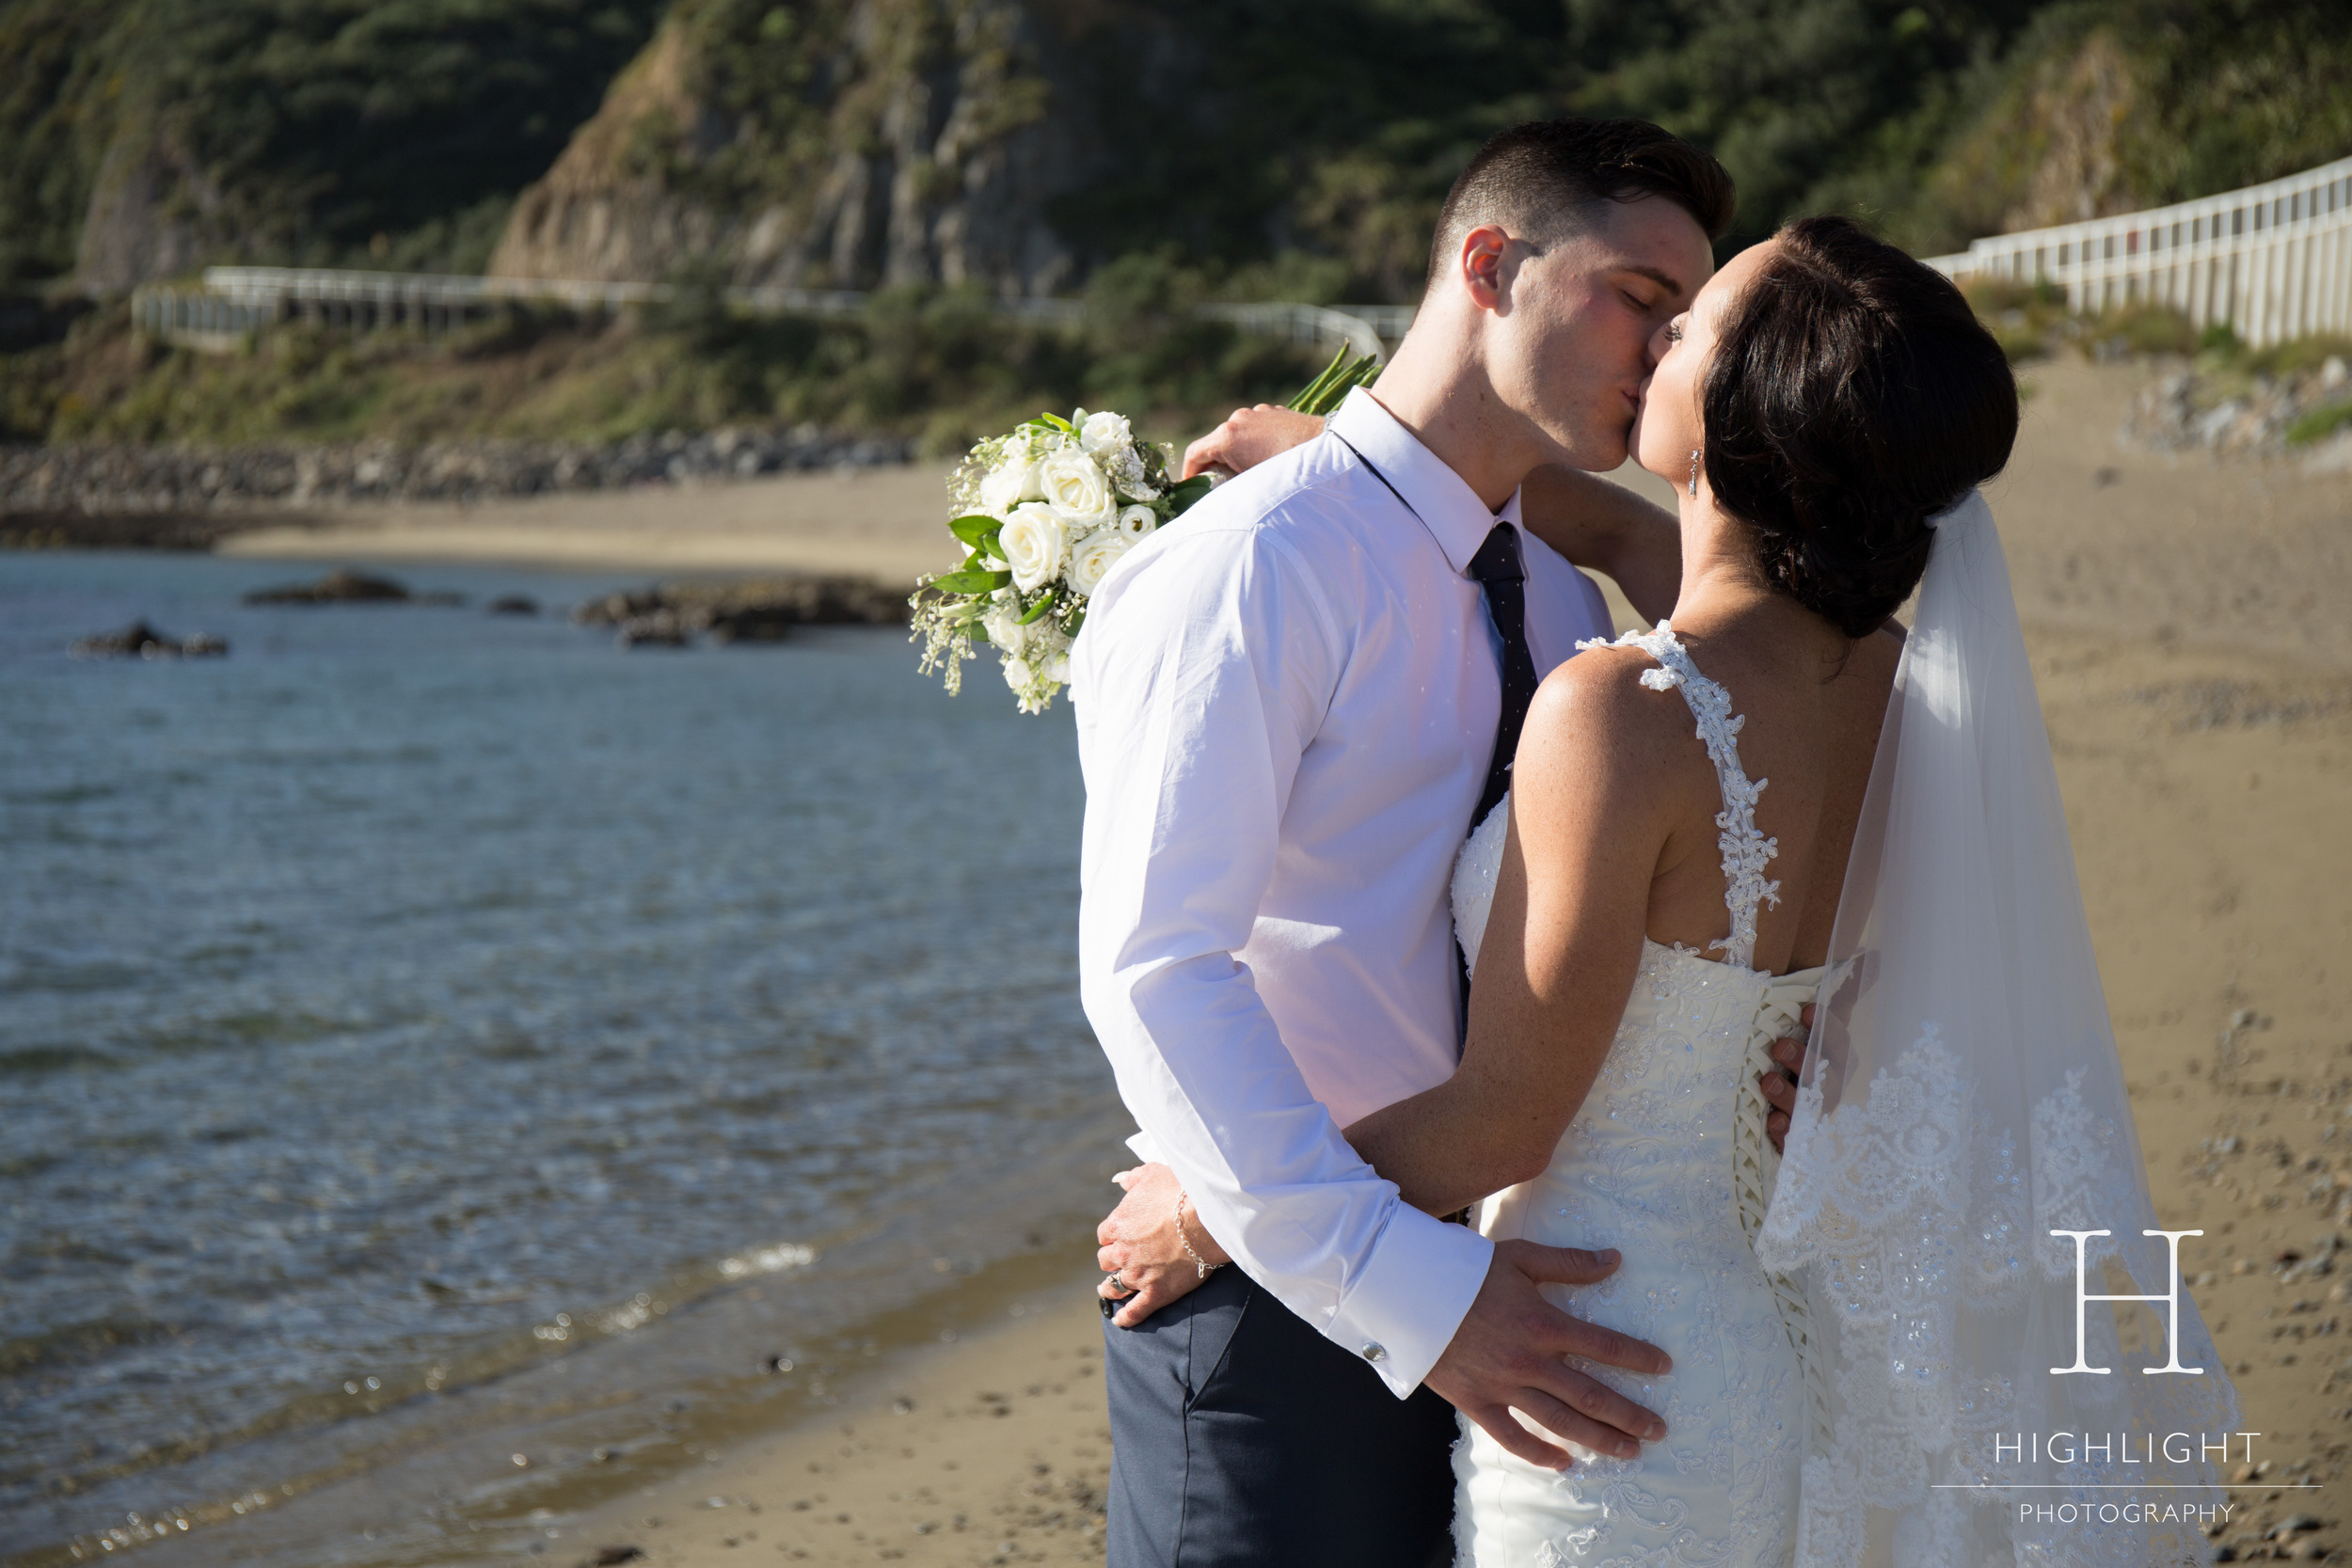 highlight_photography_wedding_new_zealand_beachkiss.jpg